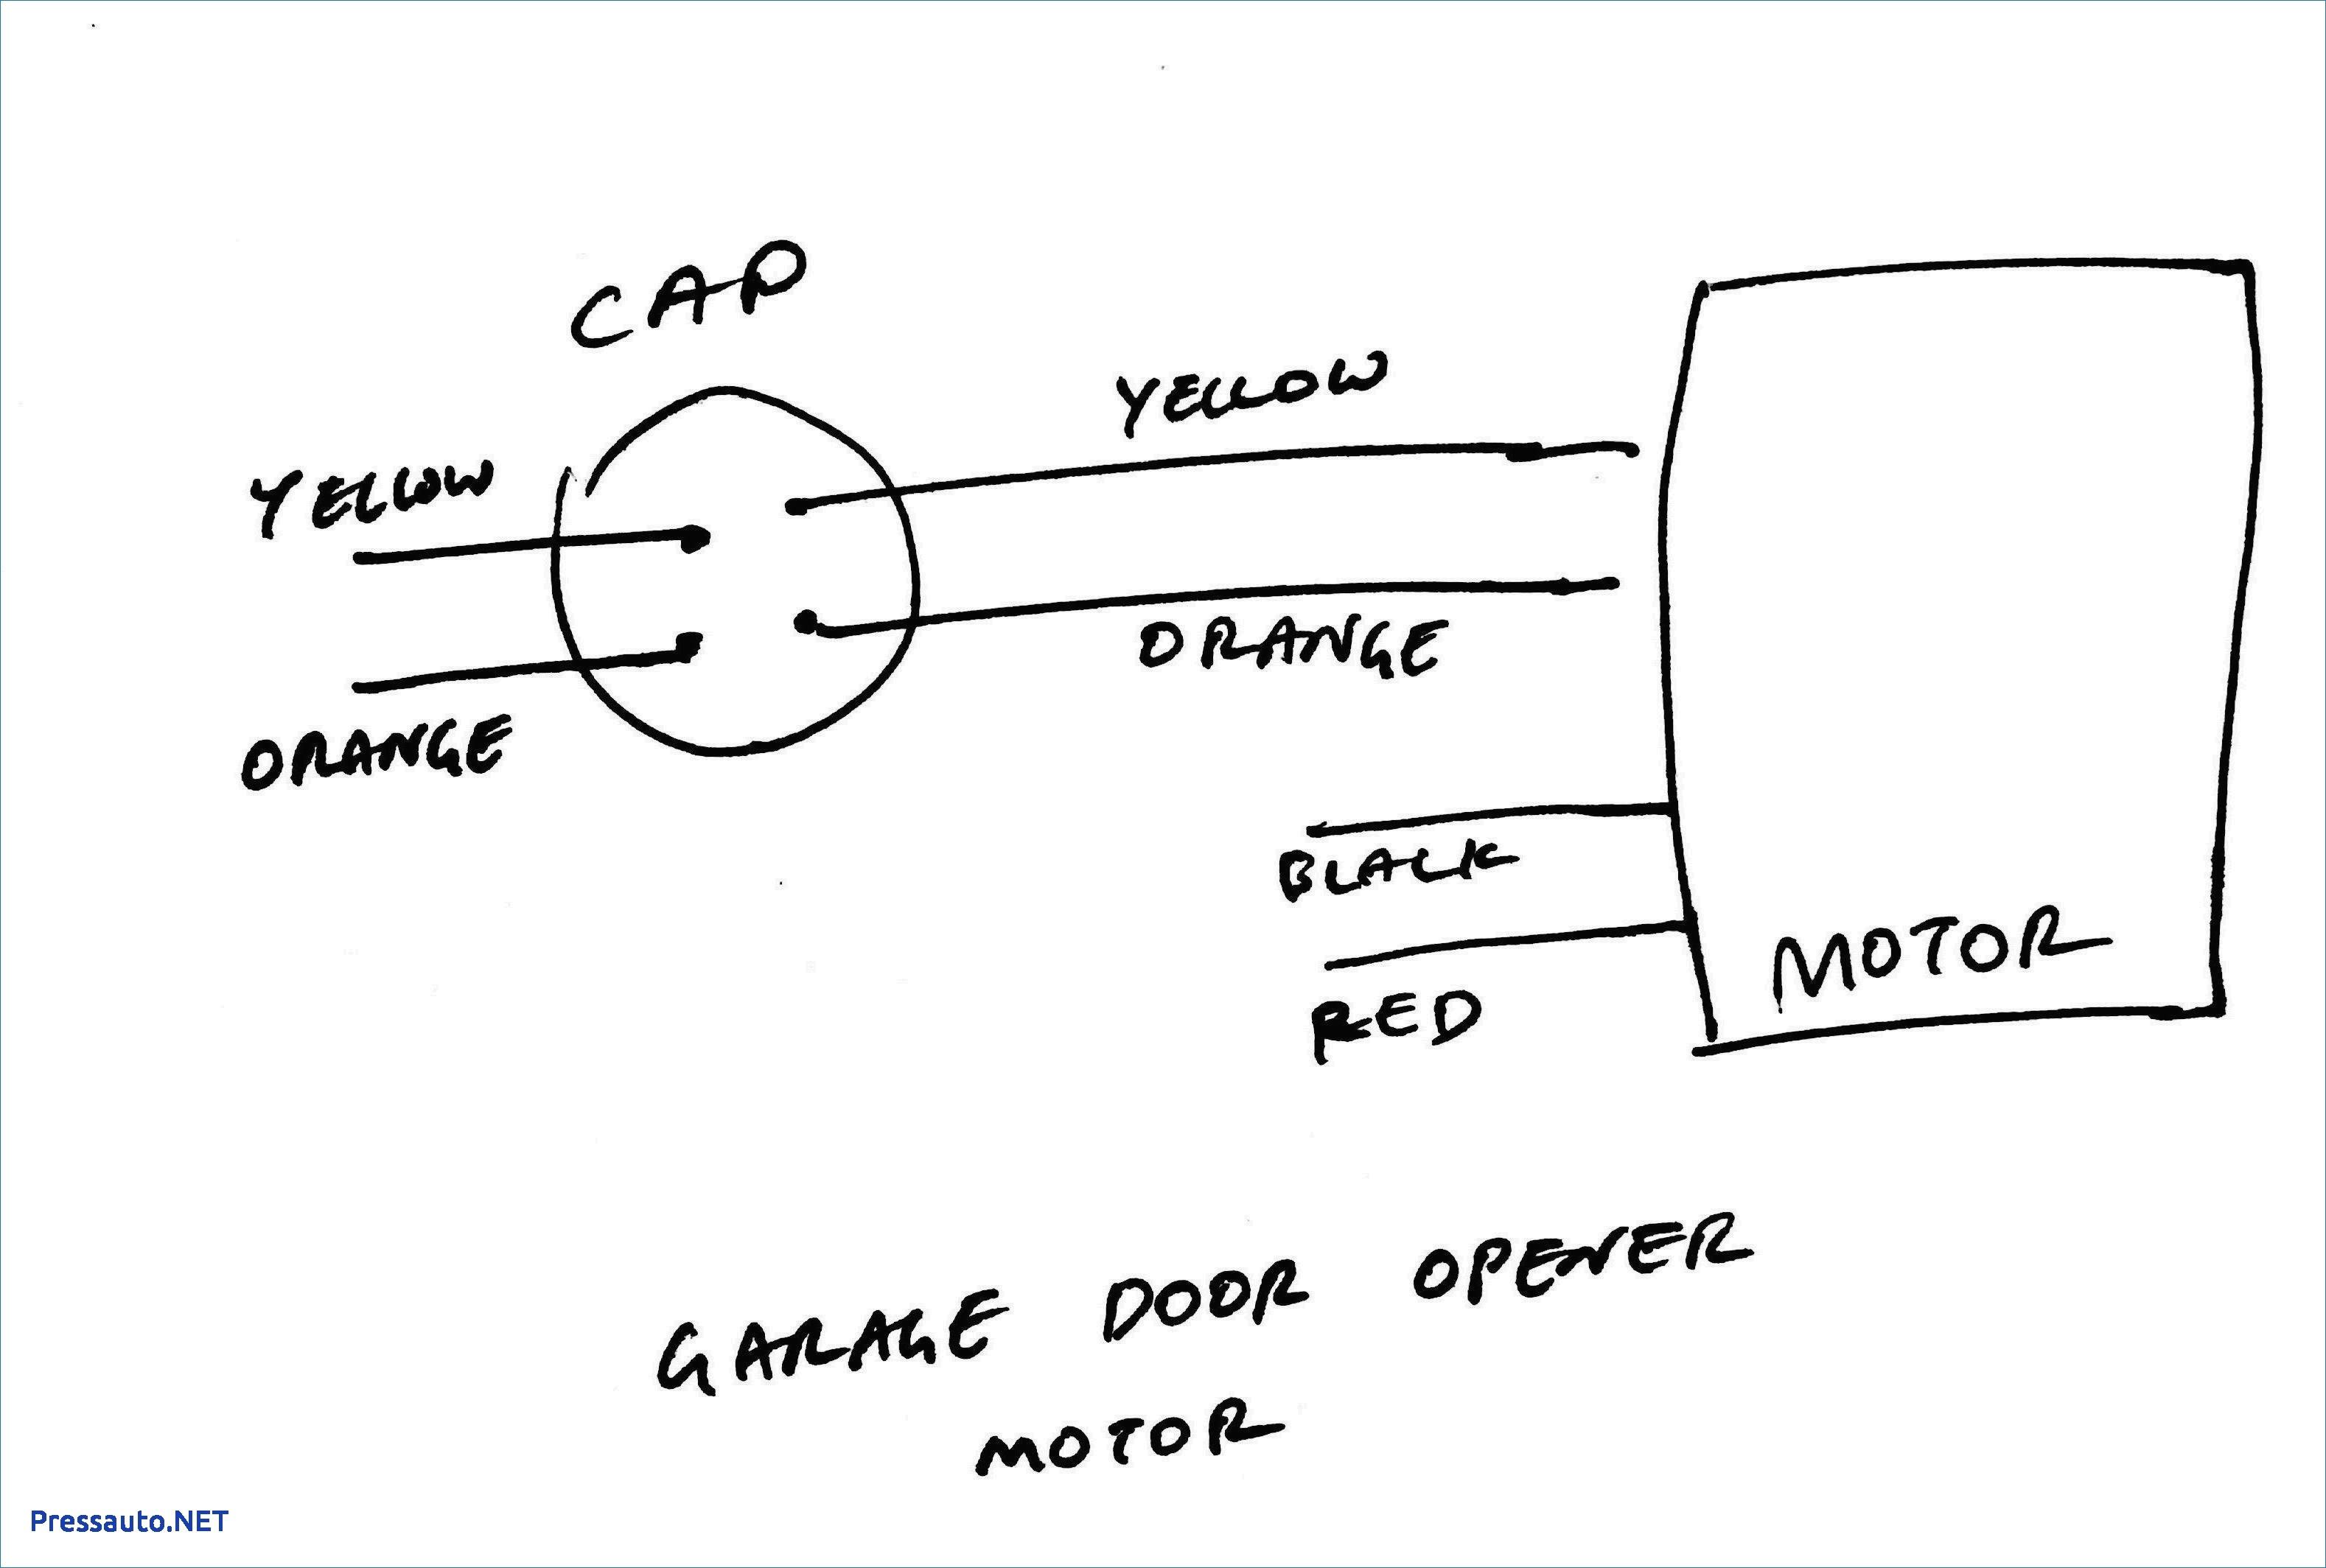 Wiring Diagram Single Phase Motor Schematicir pressor Capacitor